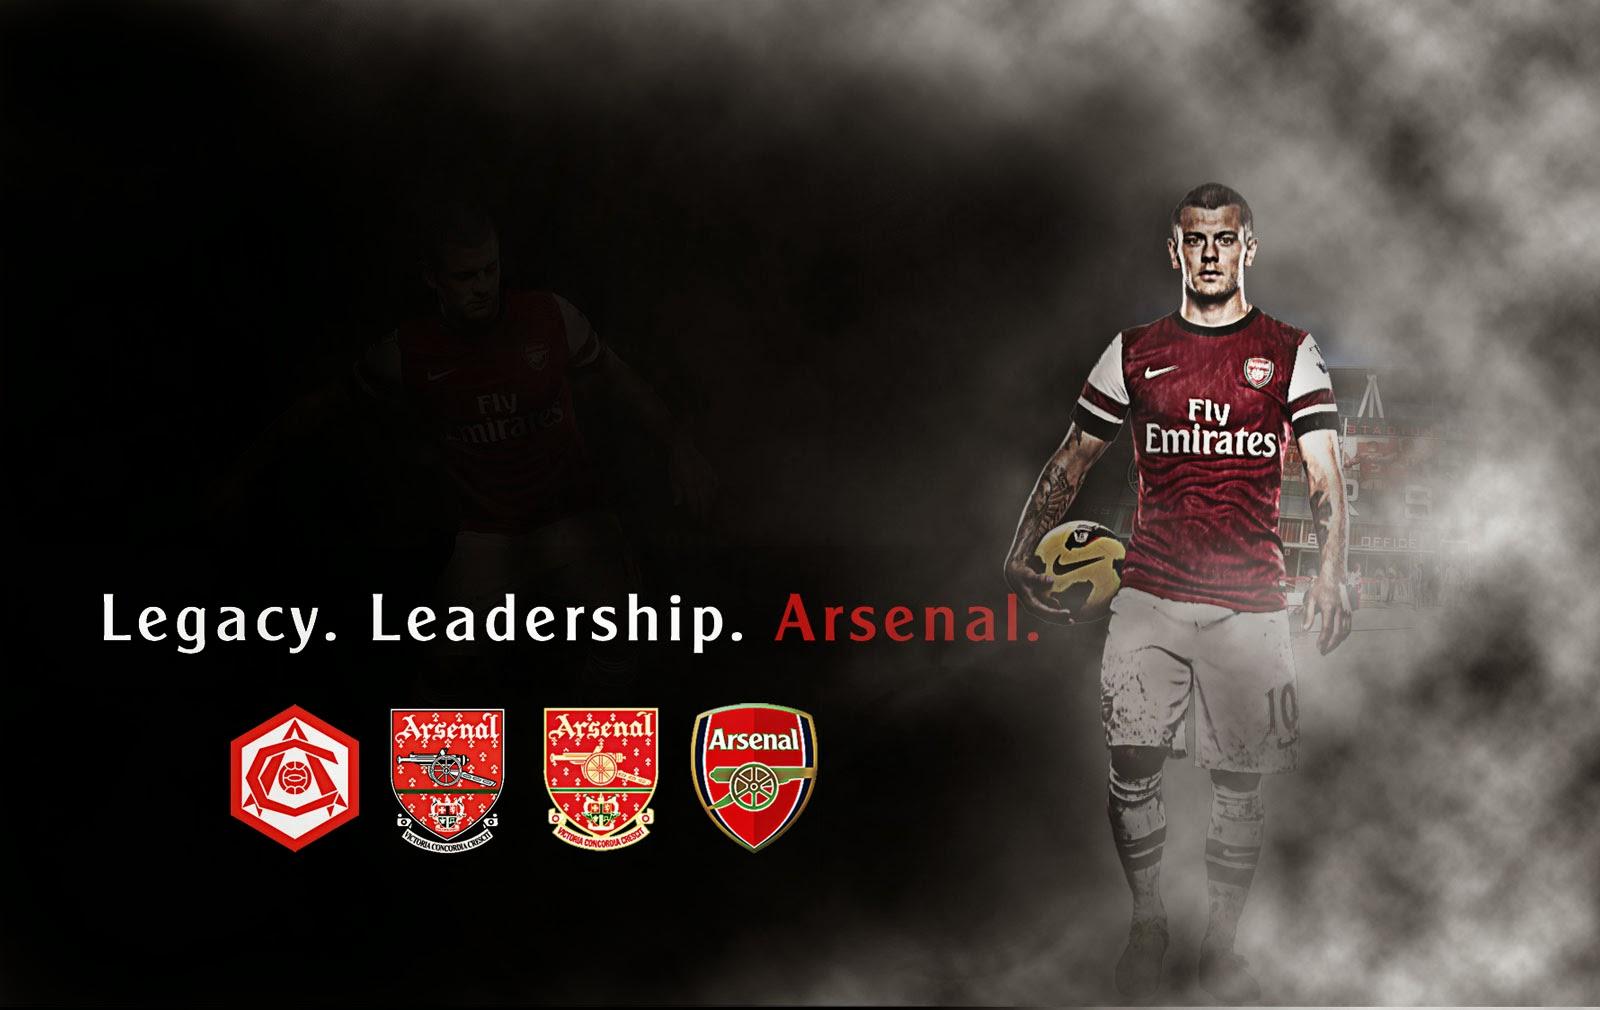 Arsenal Football Club Wallpaper Profil Pemain Sepak Bola